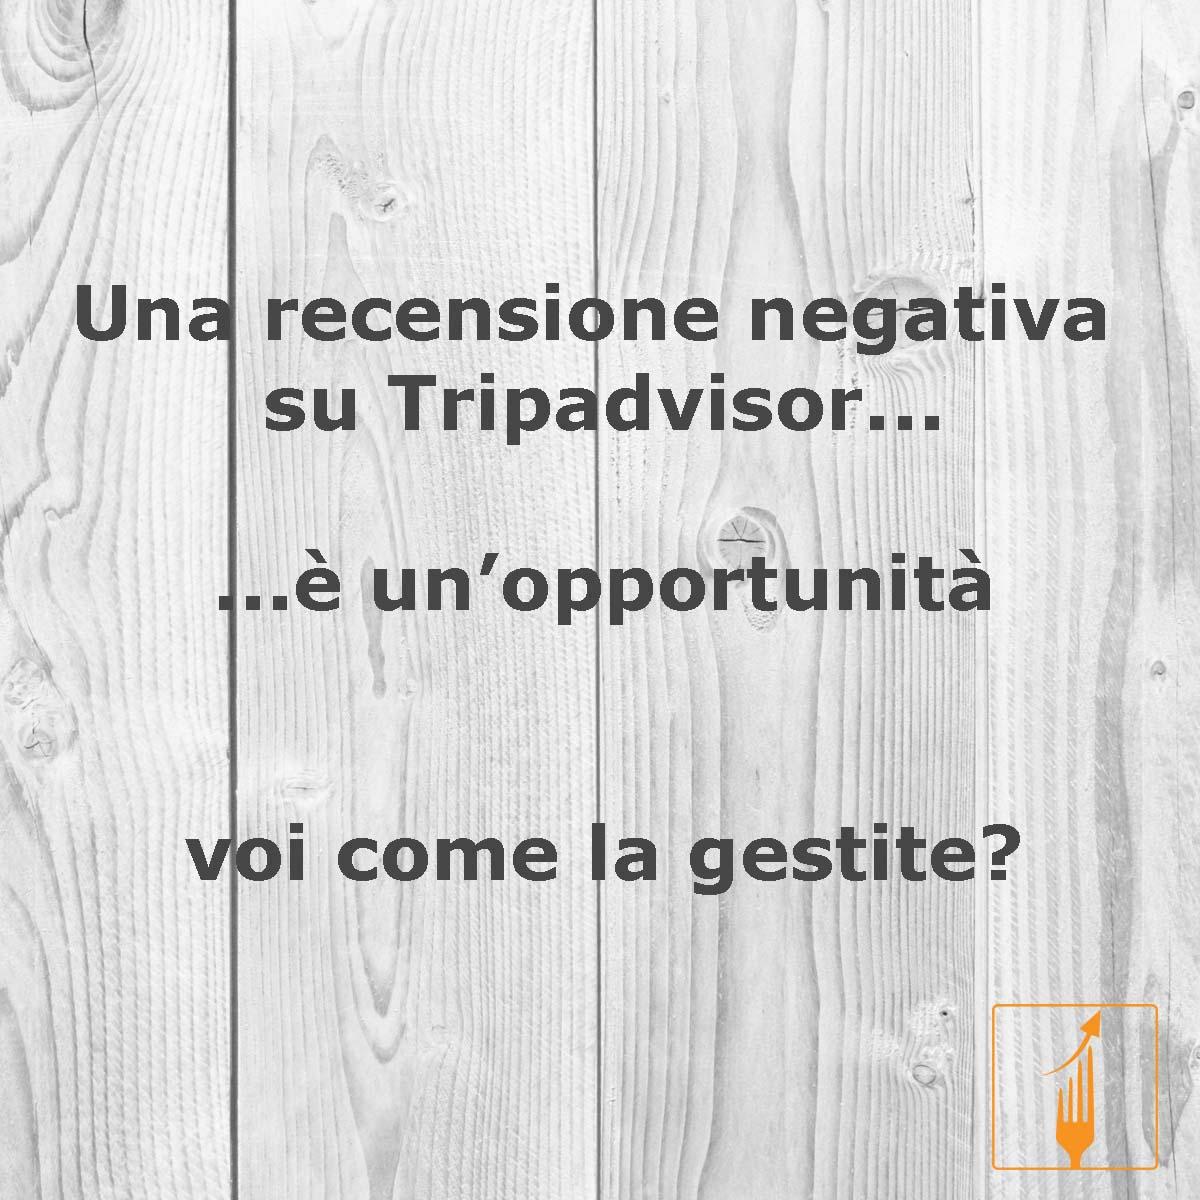 Tripadvisor_strategia_recensioni_ristoranti